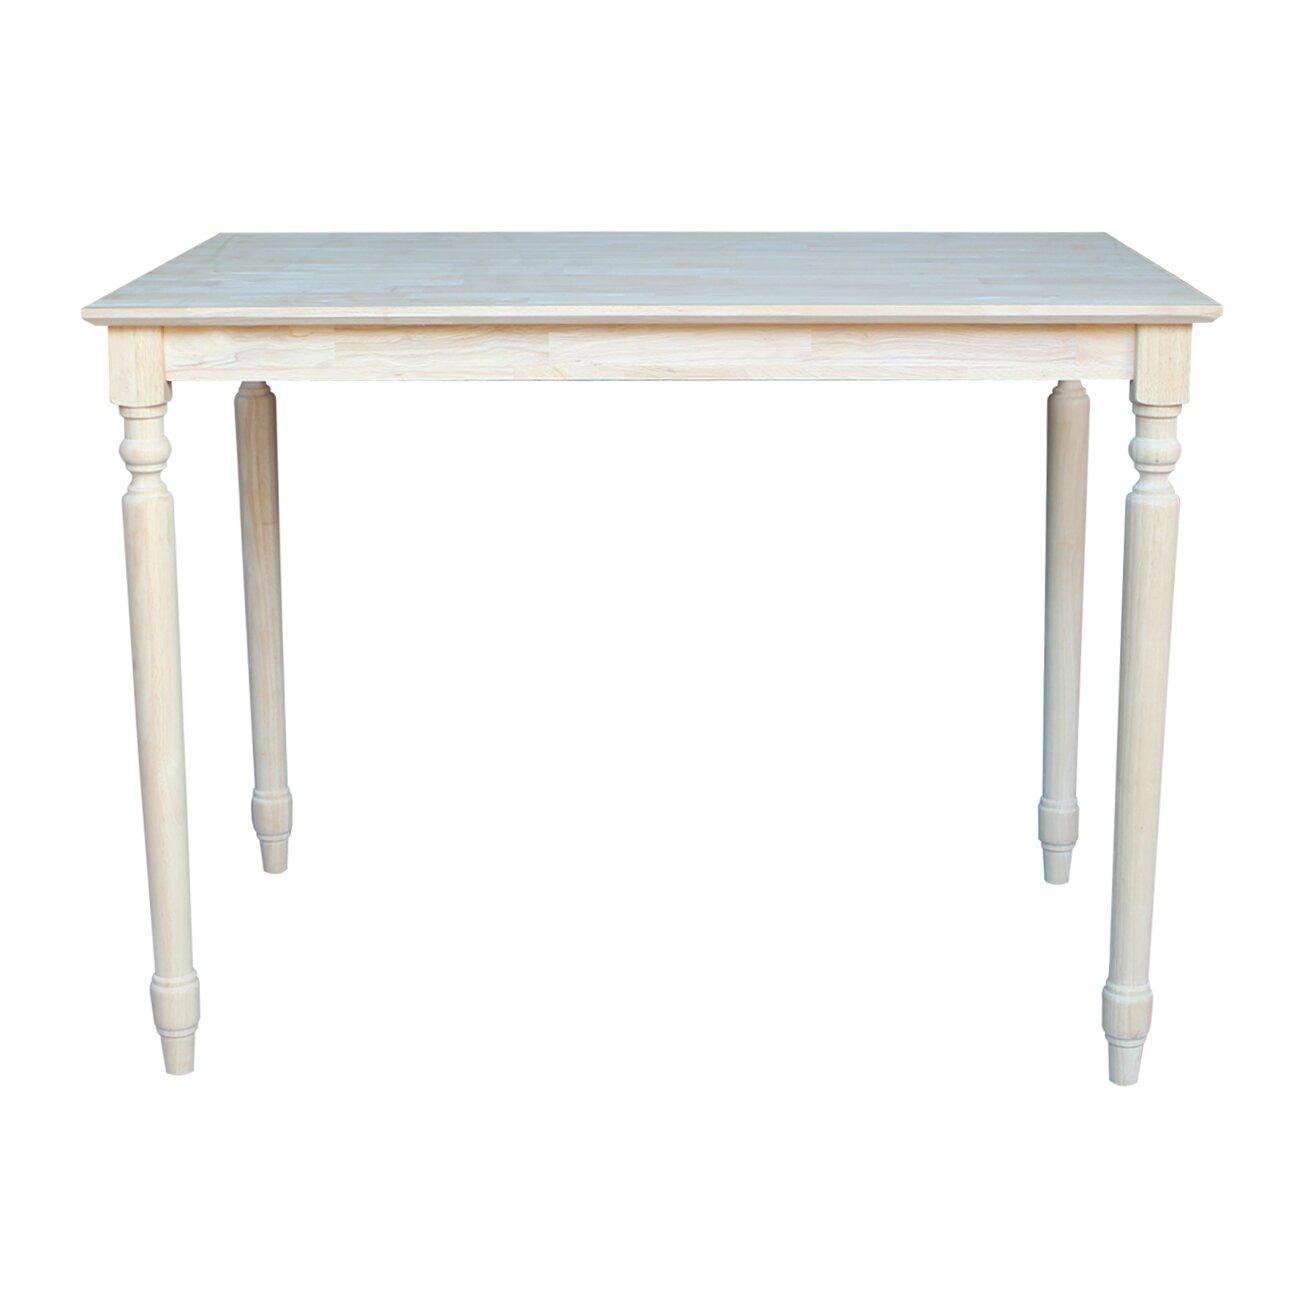 International Concepts Counter Height Dining Table III  : CounterHeightDiningTableIII from www.wayfair.com size 1300 x 1300 jpeg 49kB